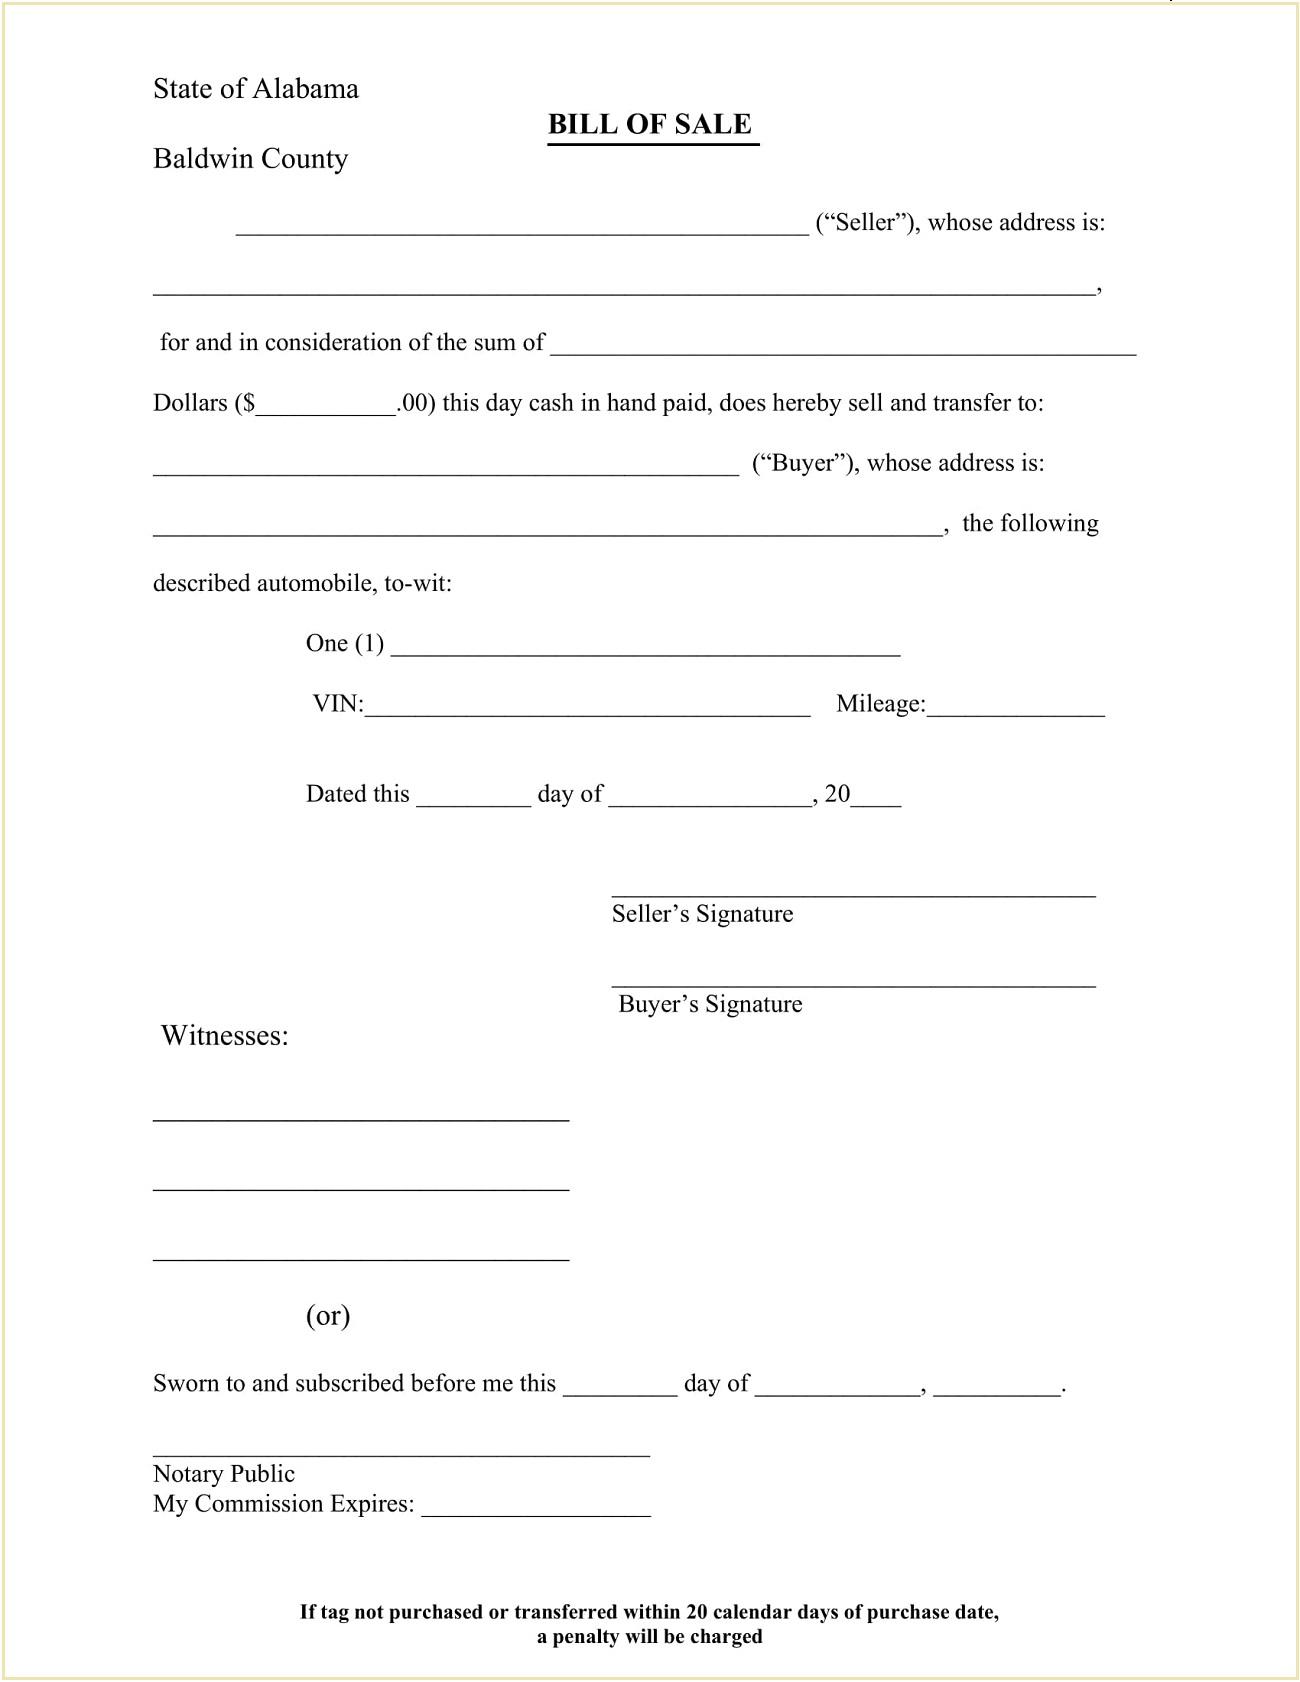 Baldwin County DMV Alabama Motor Vehicle Bill of Sale Form Template PDF